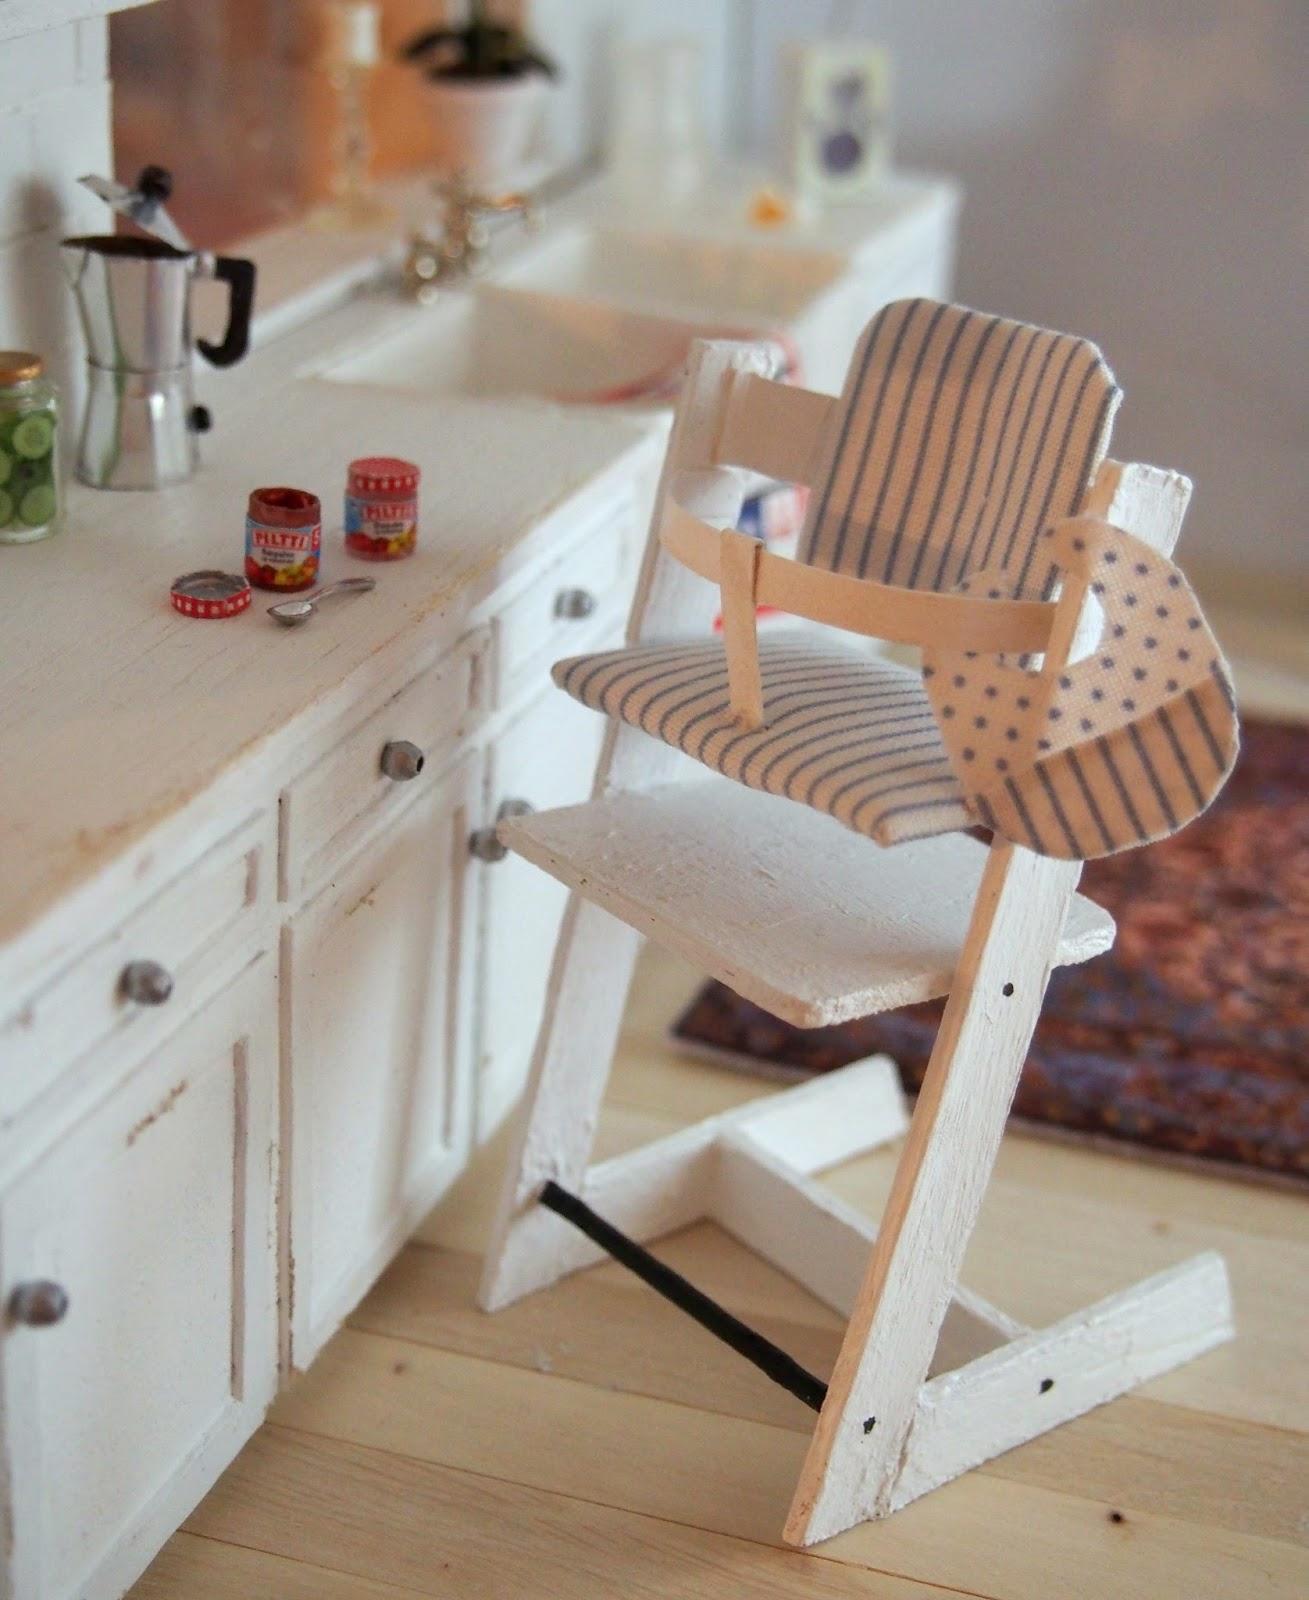 nukkekoti casablanca tripp trapp ja kahvia tripp trapp highchair and coffee. Black Bedroom Furniture Sets. Home Design Ideas